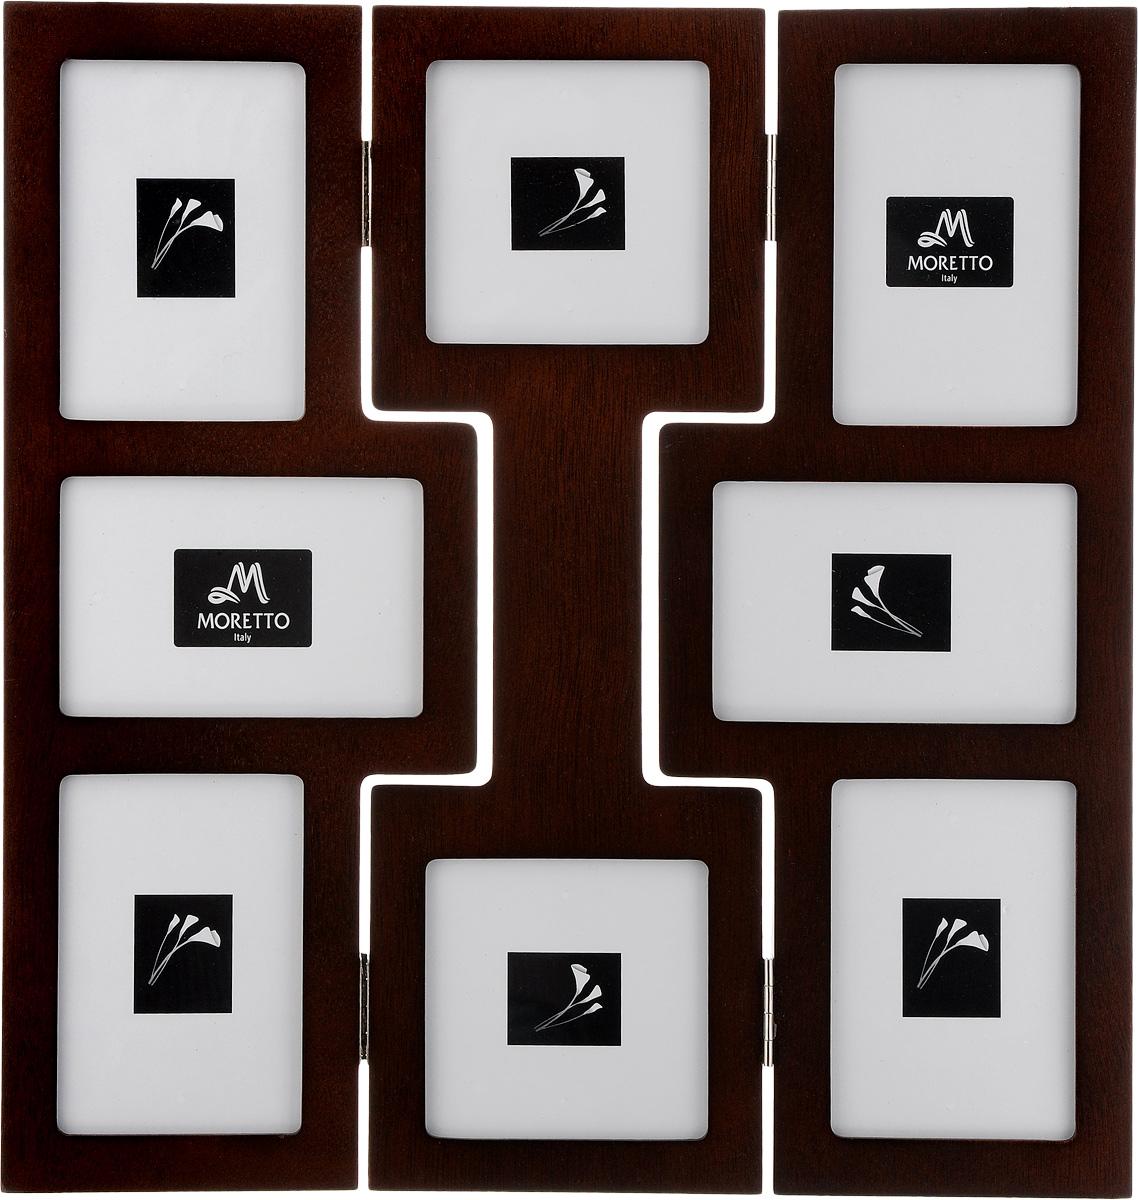 Фоторамка Moretto, на 8 фото. 238011 шкатулка для мужчин moretto 24 см х 19 см х 8 см 139542